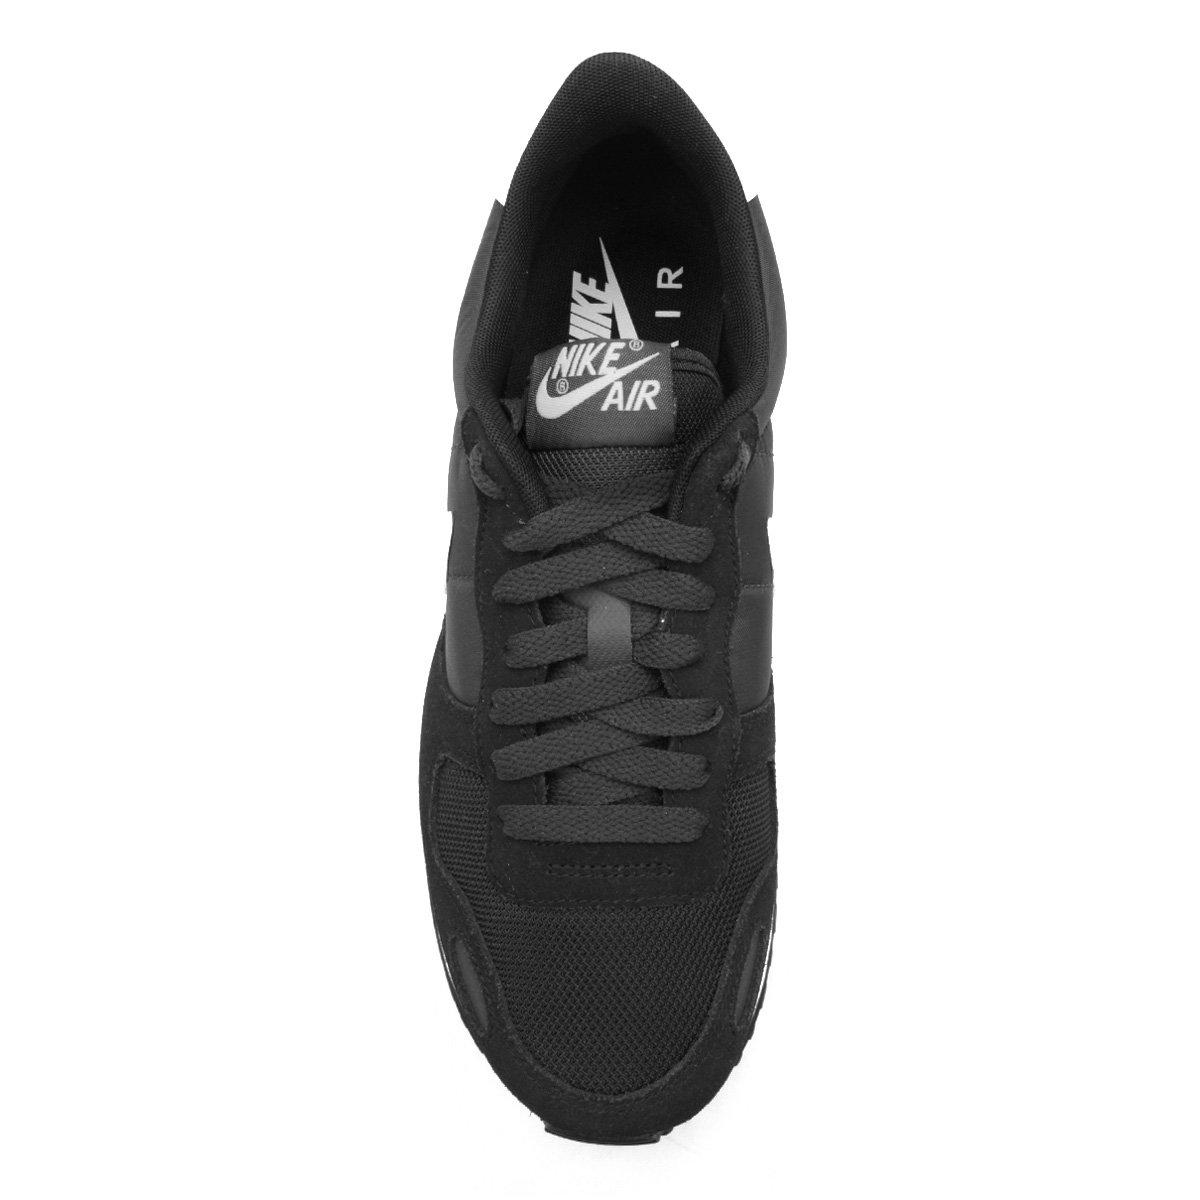 Vrtx Preto Air Masculino Tênis Tênis Nike Nike e Branco cgPBqIB